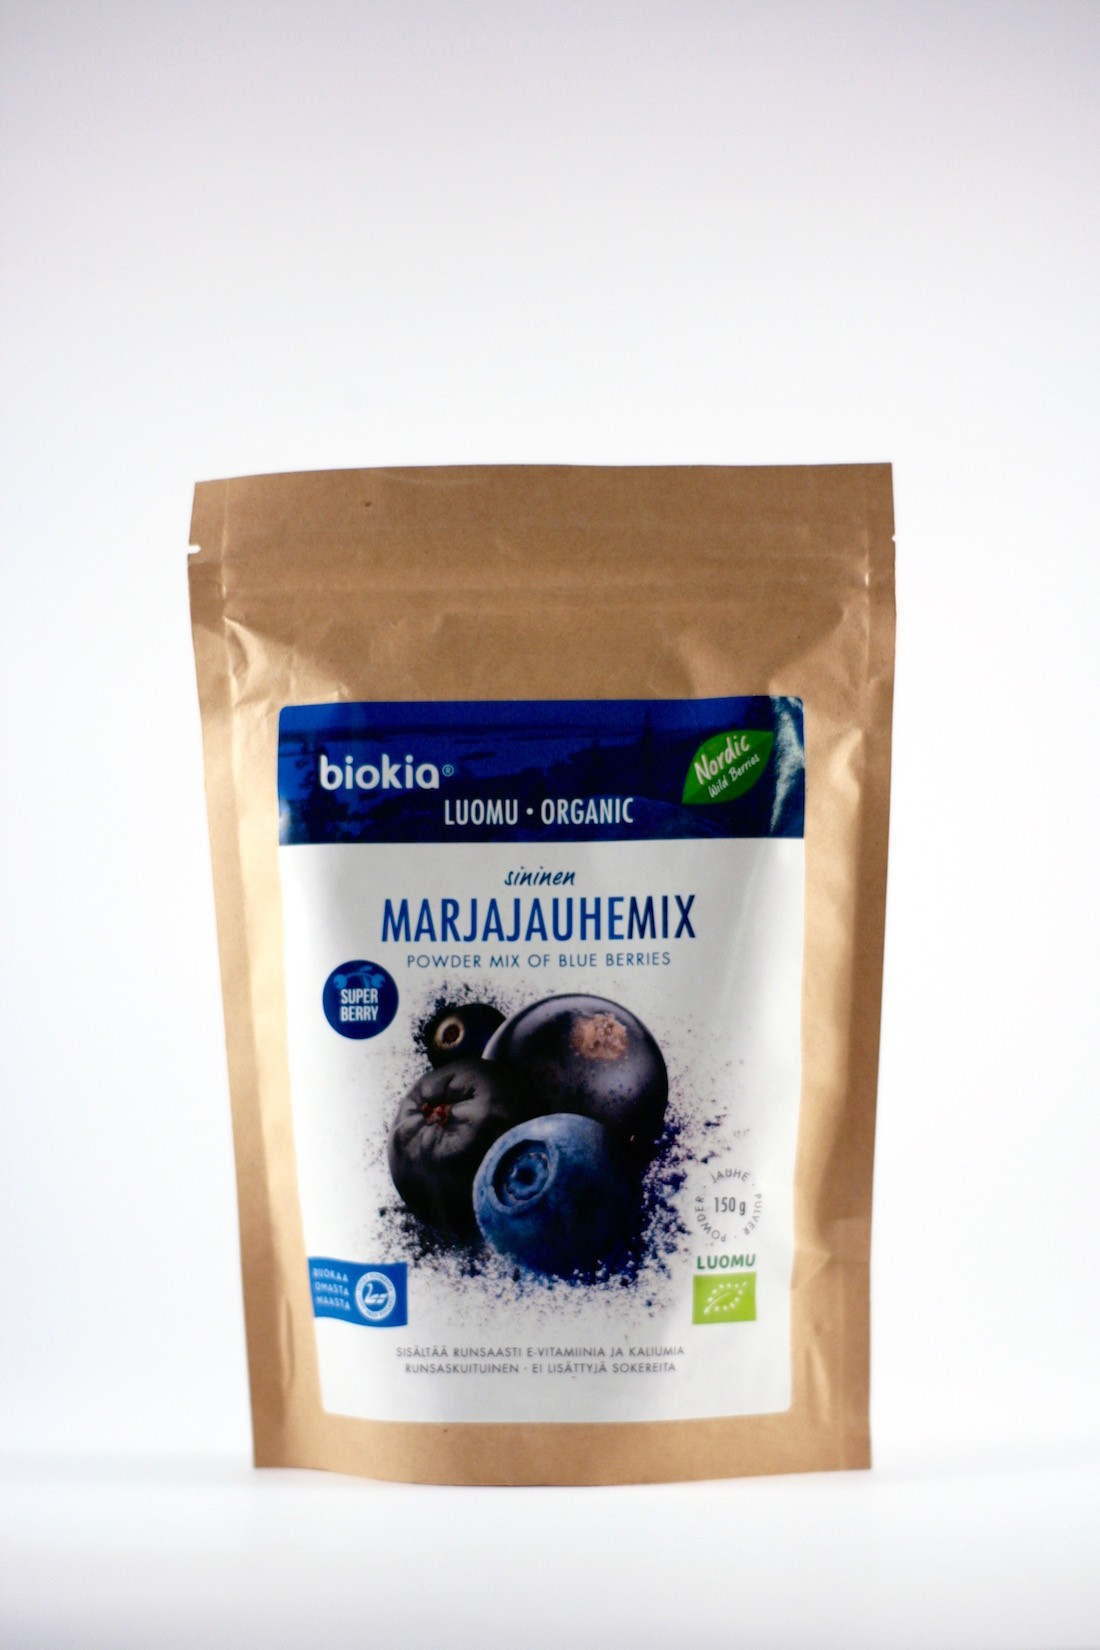 Wilde bosbessenpoeder blauw organic 150gr. Biokia